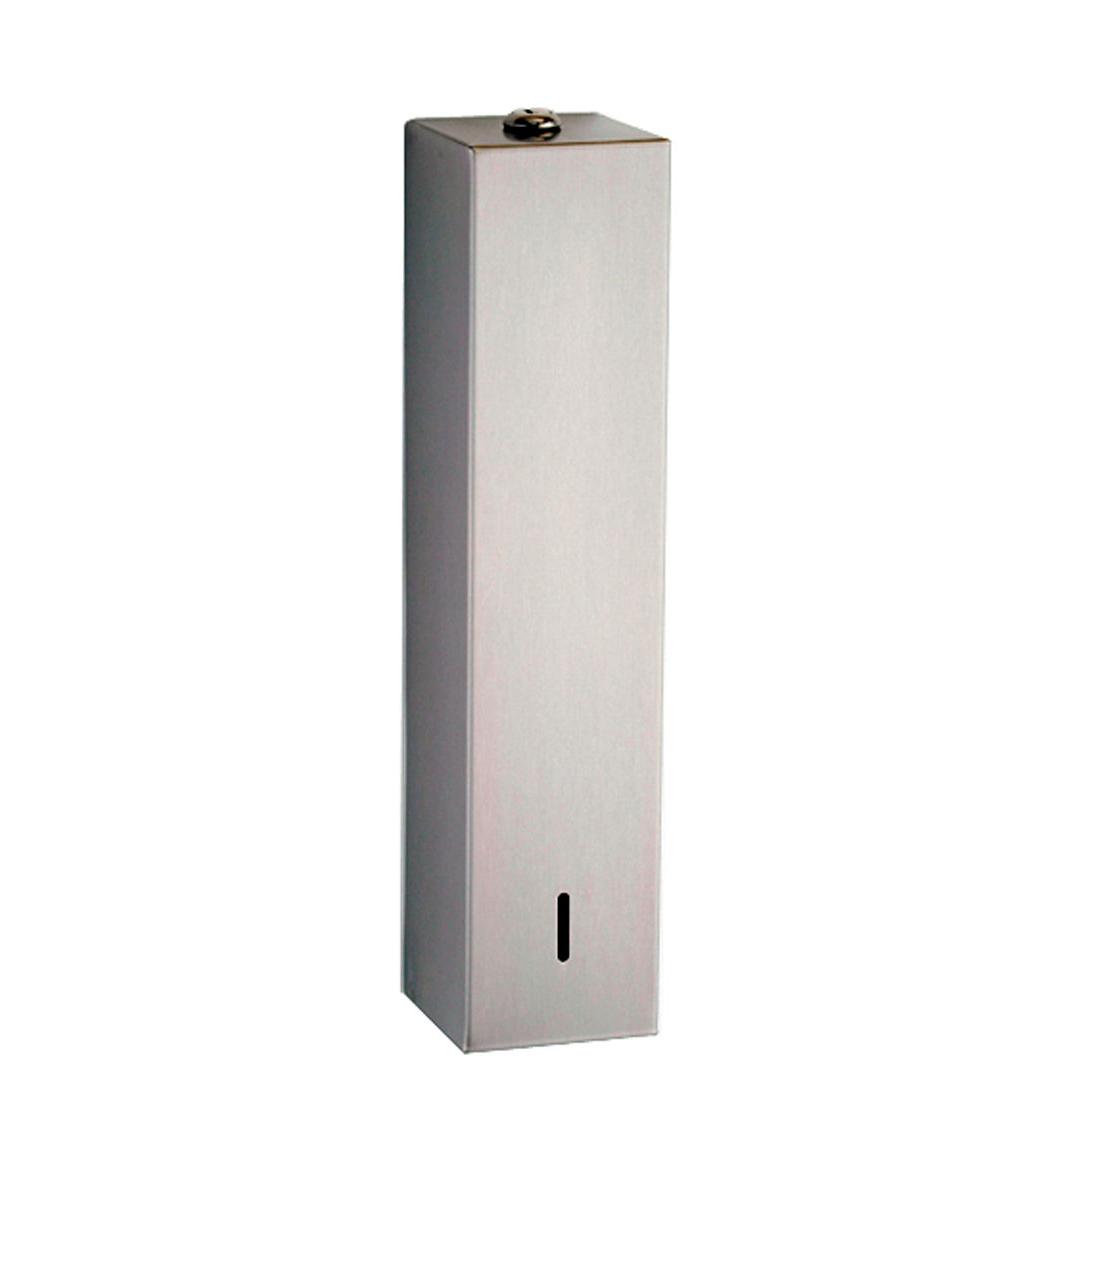 Gamco Cup Dispenser Model Cd 1 Washroom Equipment